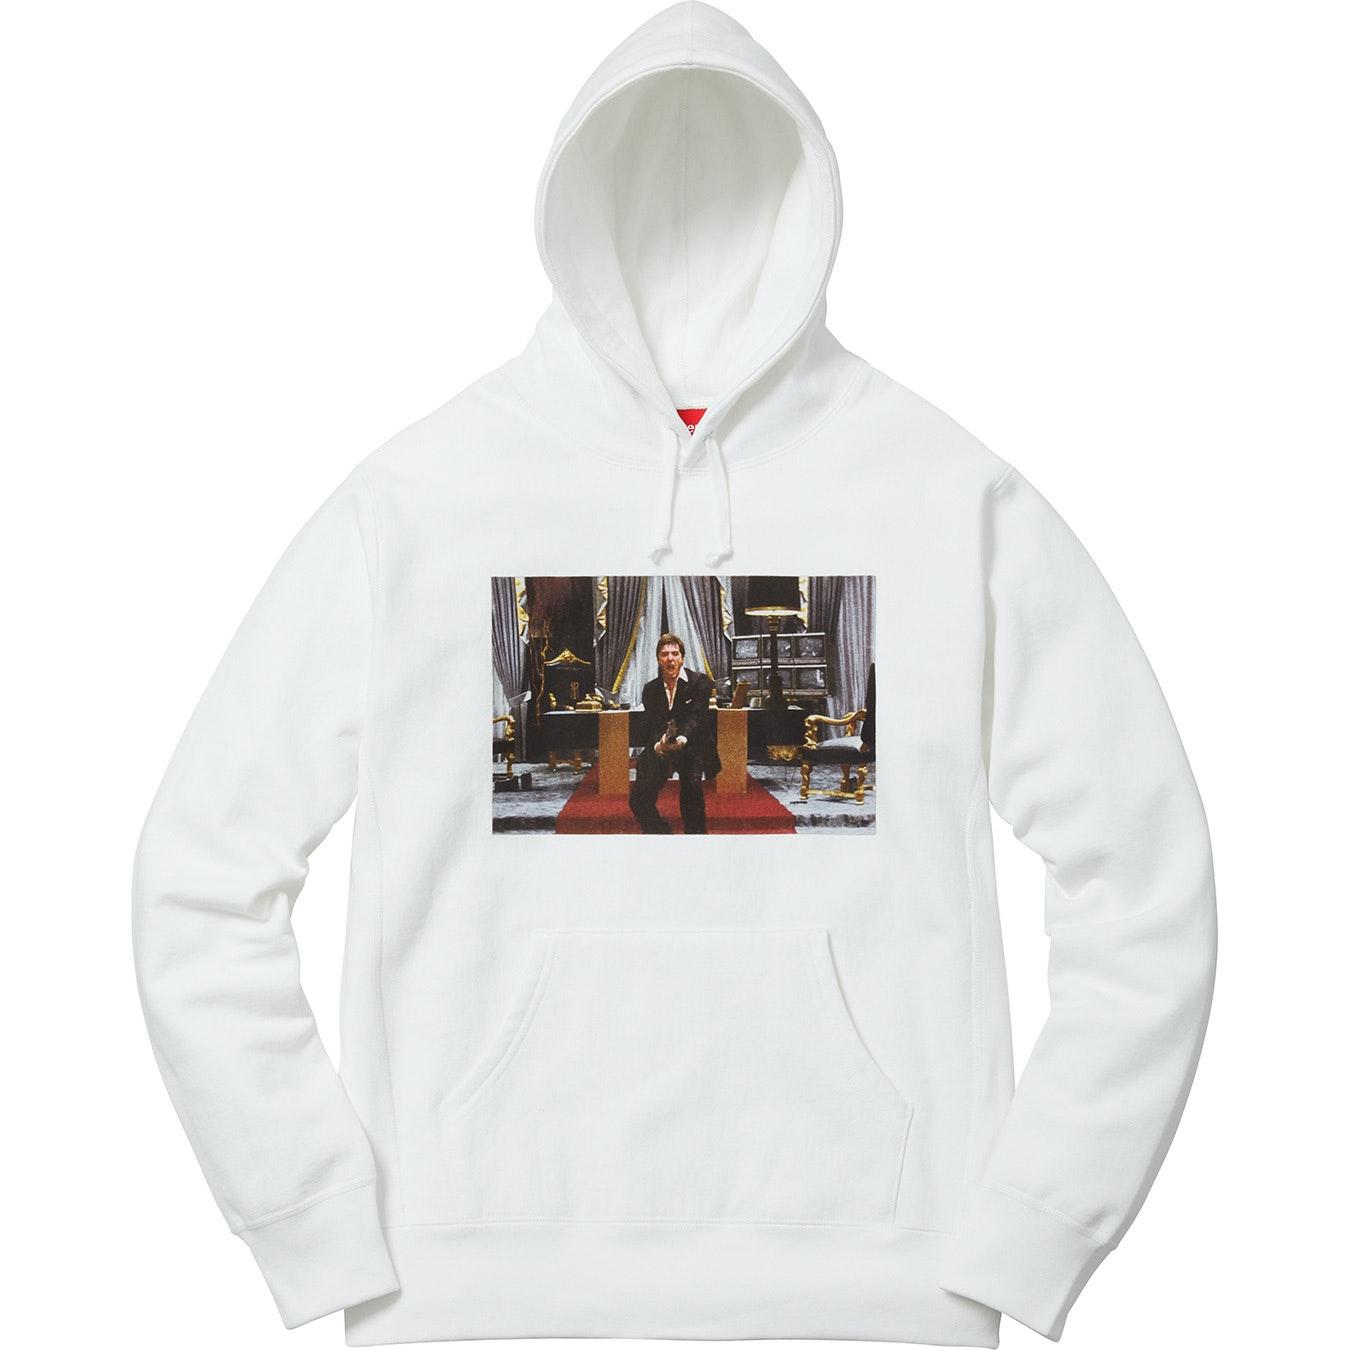 Supreme Scarface Friend Hooded Sweatshirt White